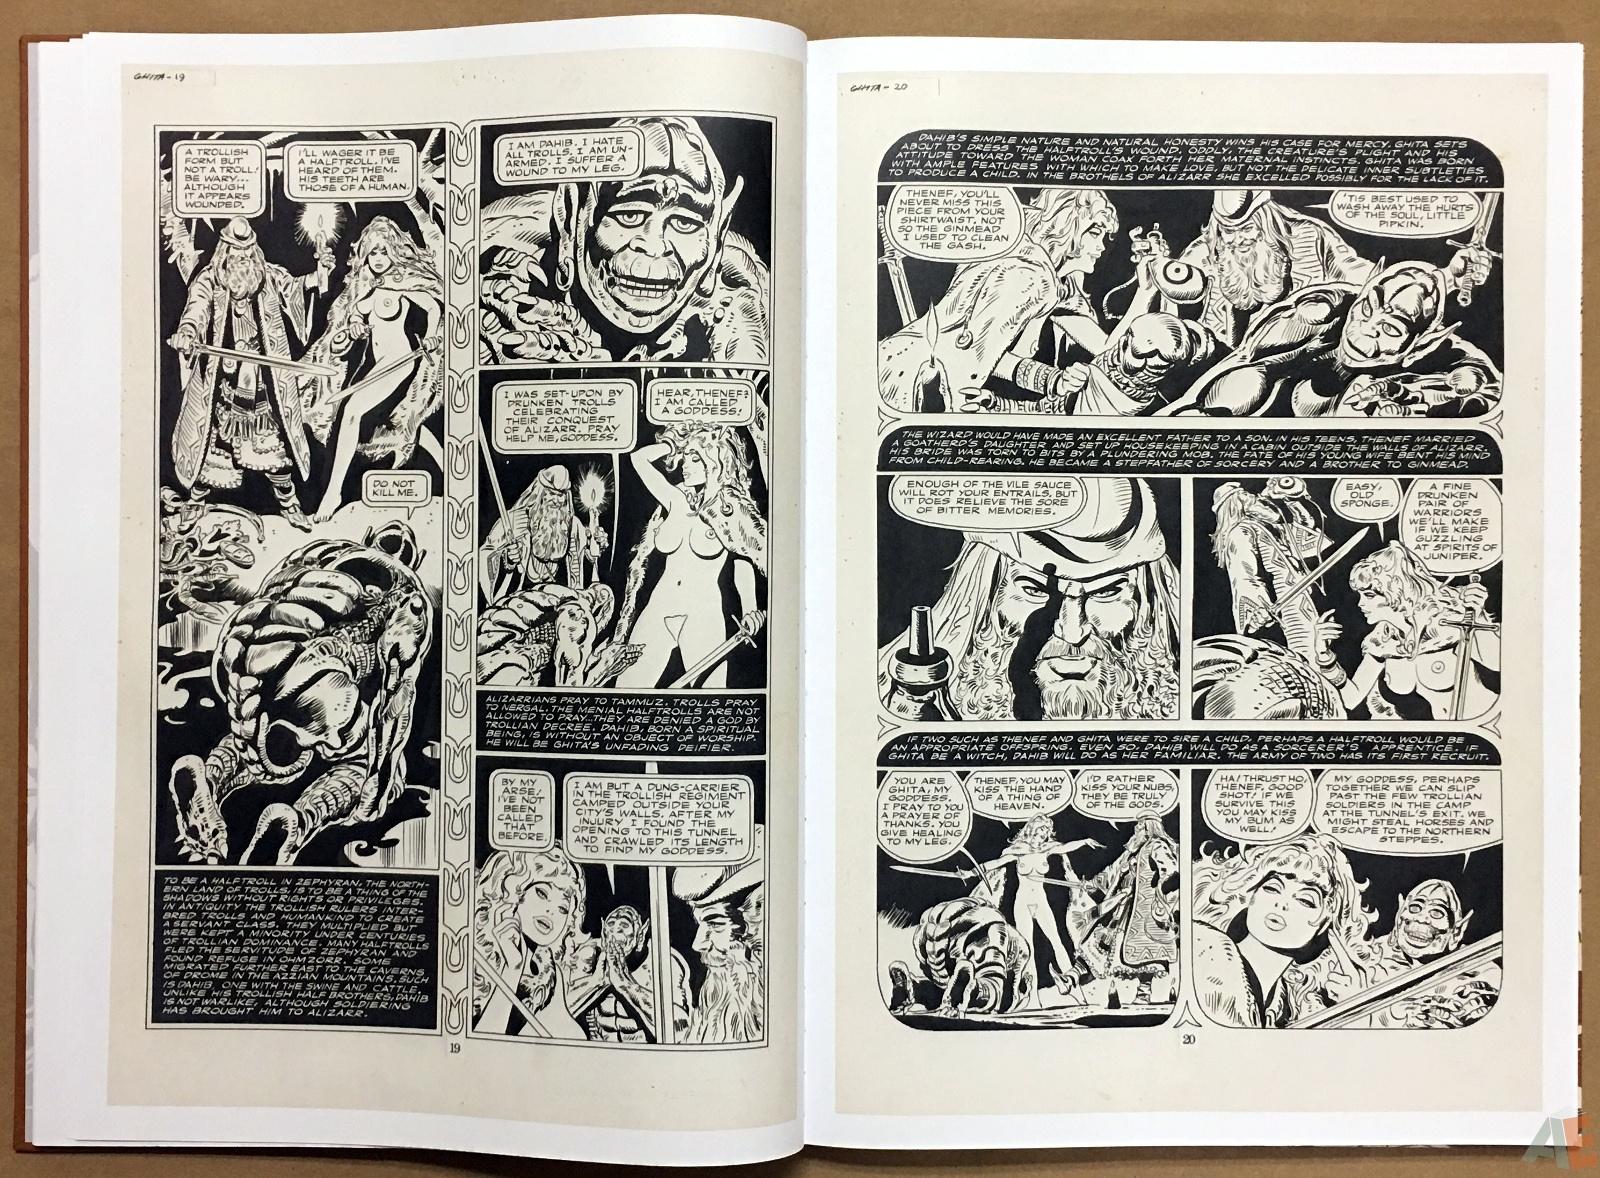 Frank Thorne's Ghita An Erotic Treasury Archival Edition Volume 1 10